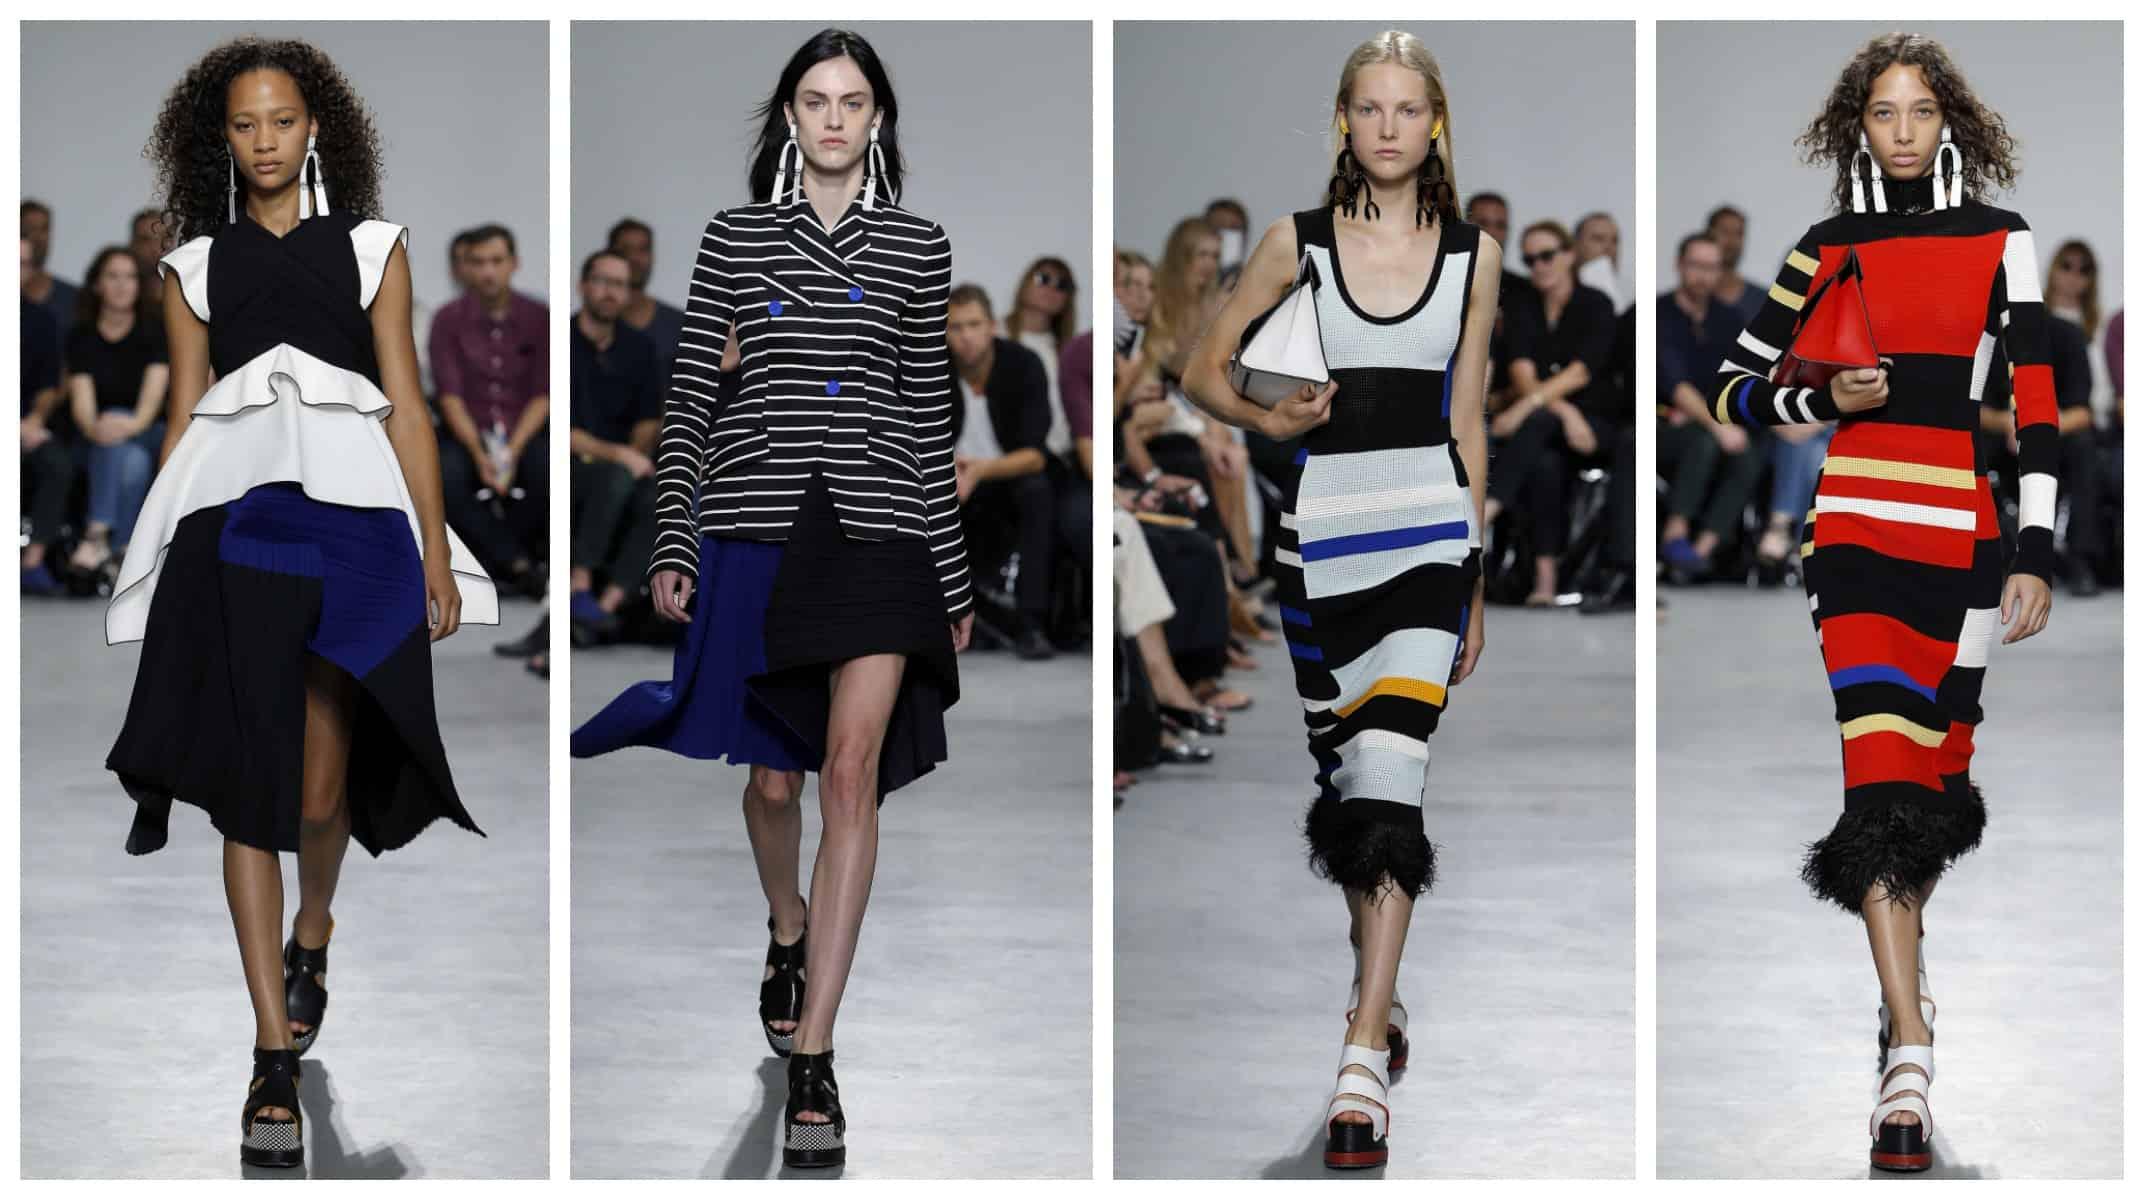 New York Fashion Week Spring 2017 - Proenza Schouler